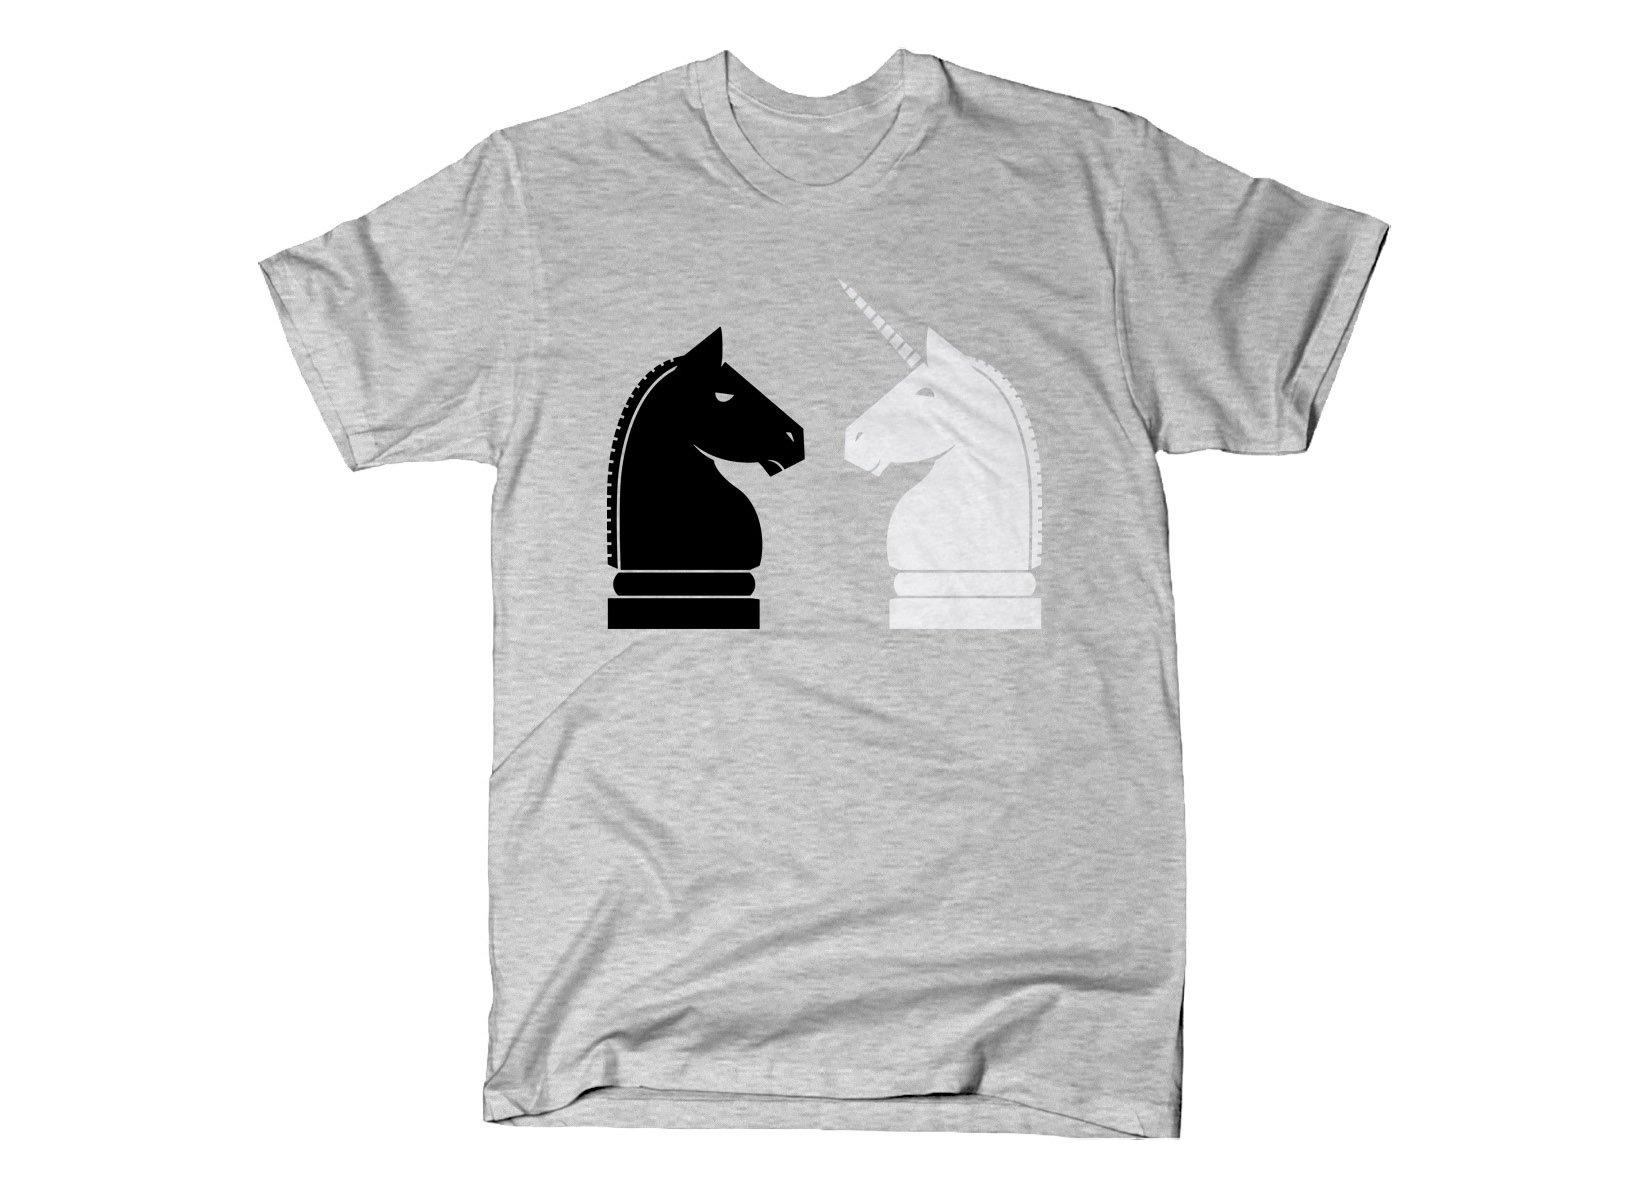 Chess Unicorn on Mens T-Shirt